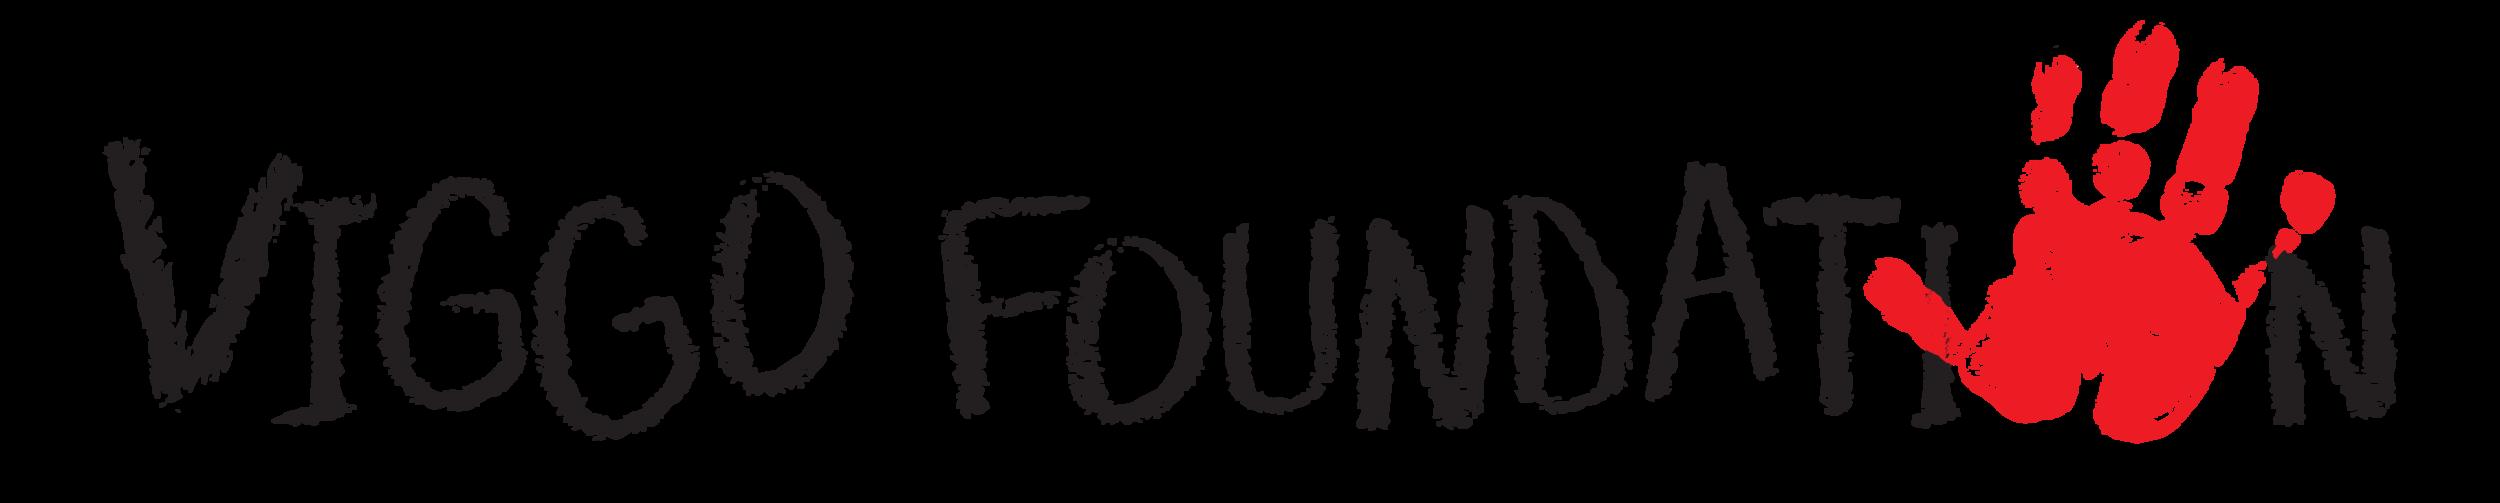 ViggoFoundation_logo.png